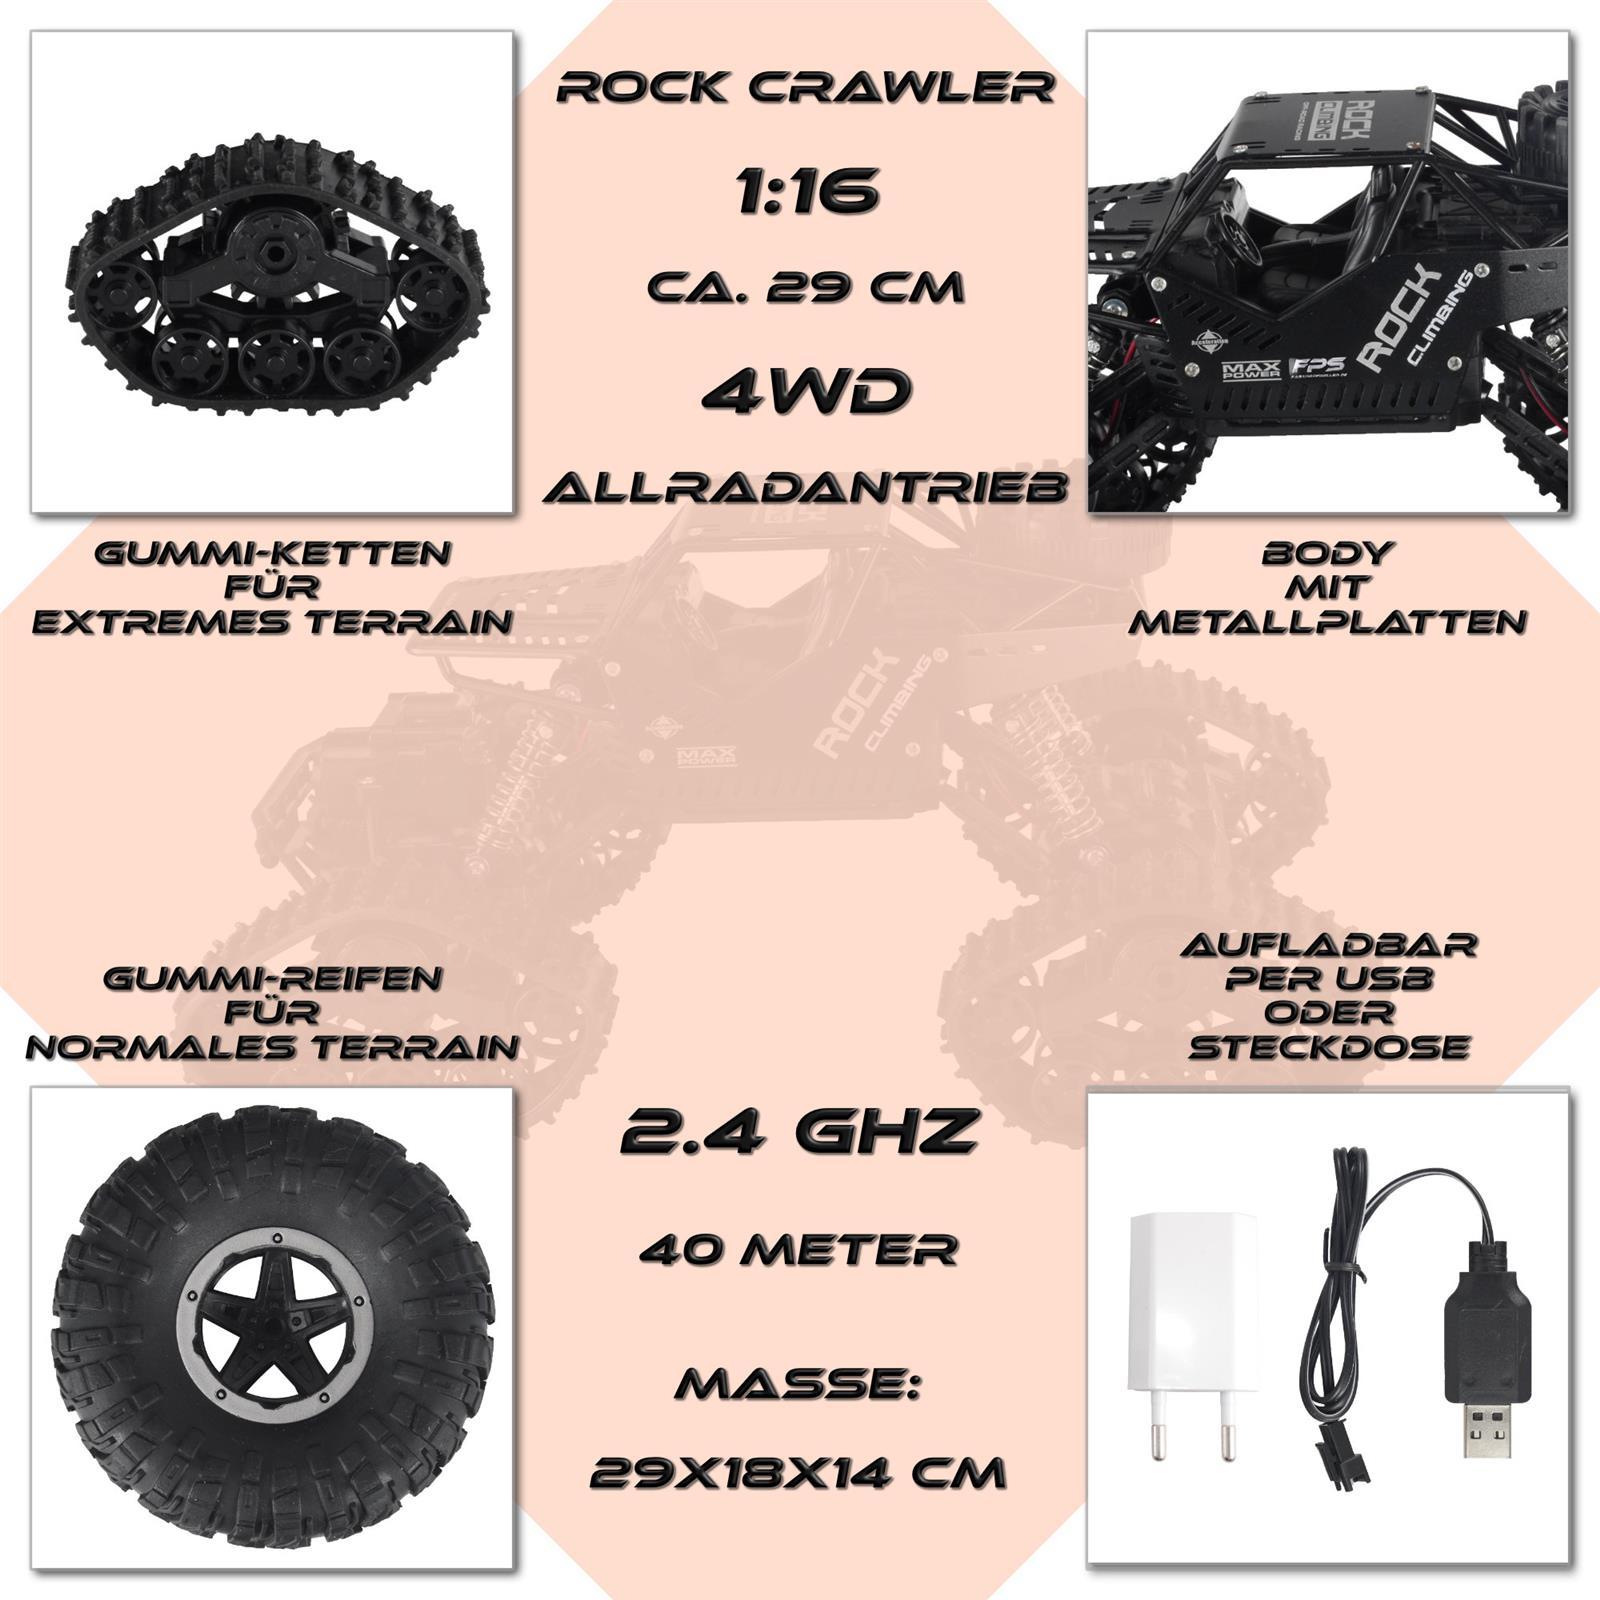 RC Rock Crawler 1 16 Highlights